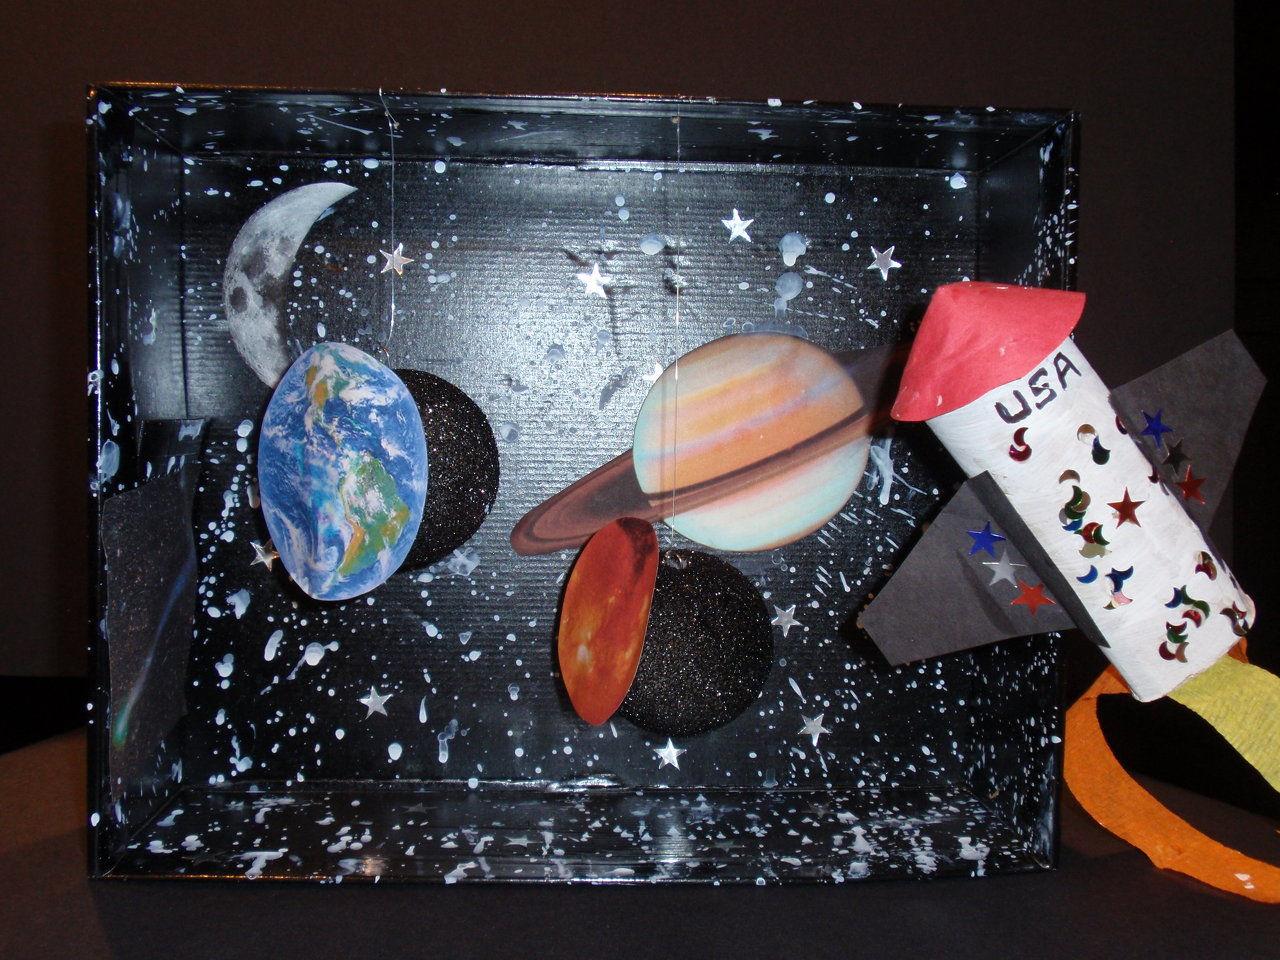 solar system model diorama - photo #21